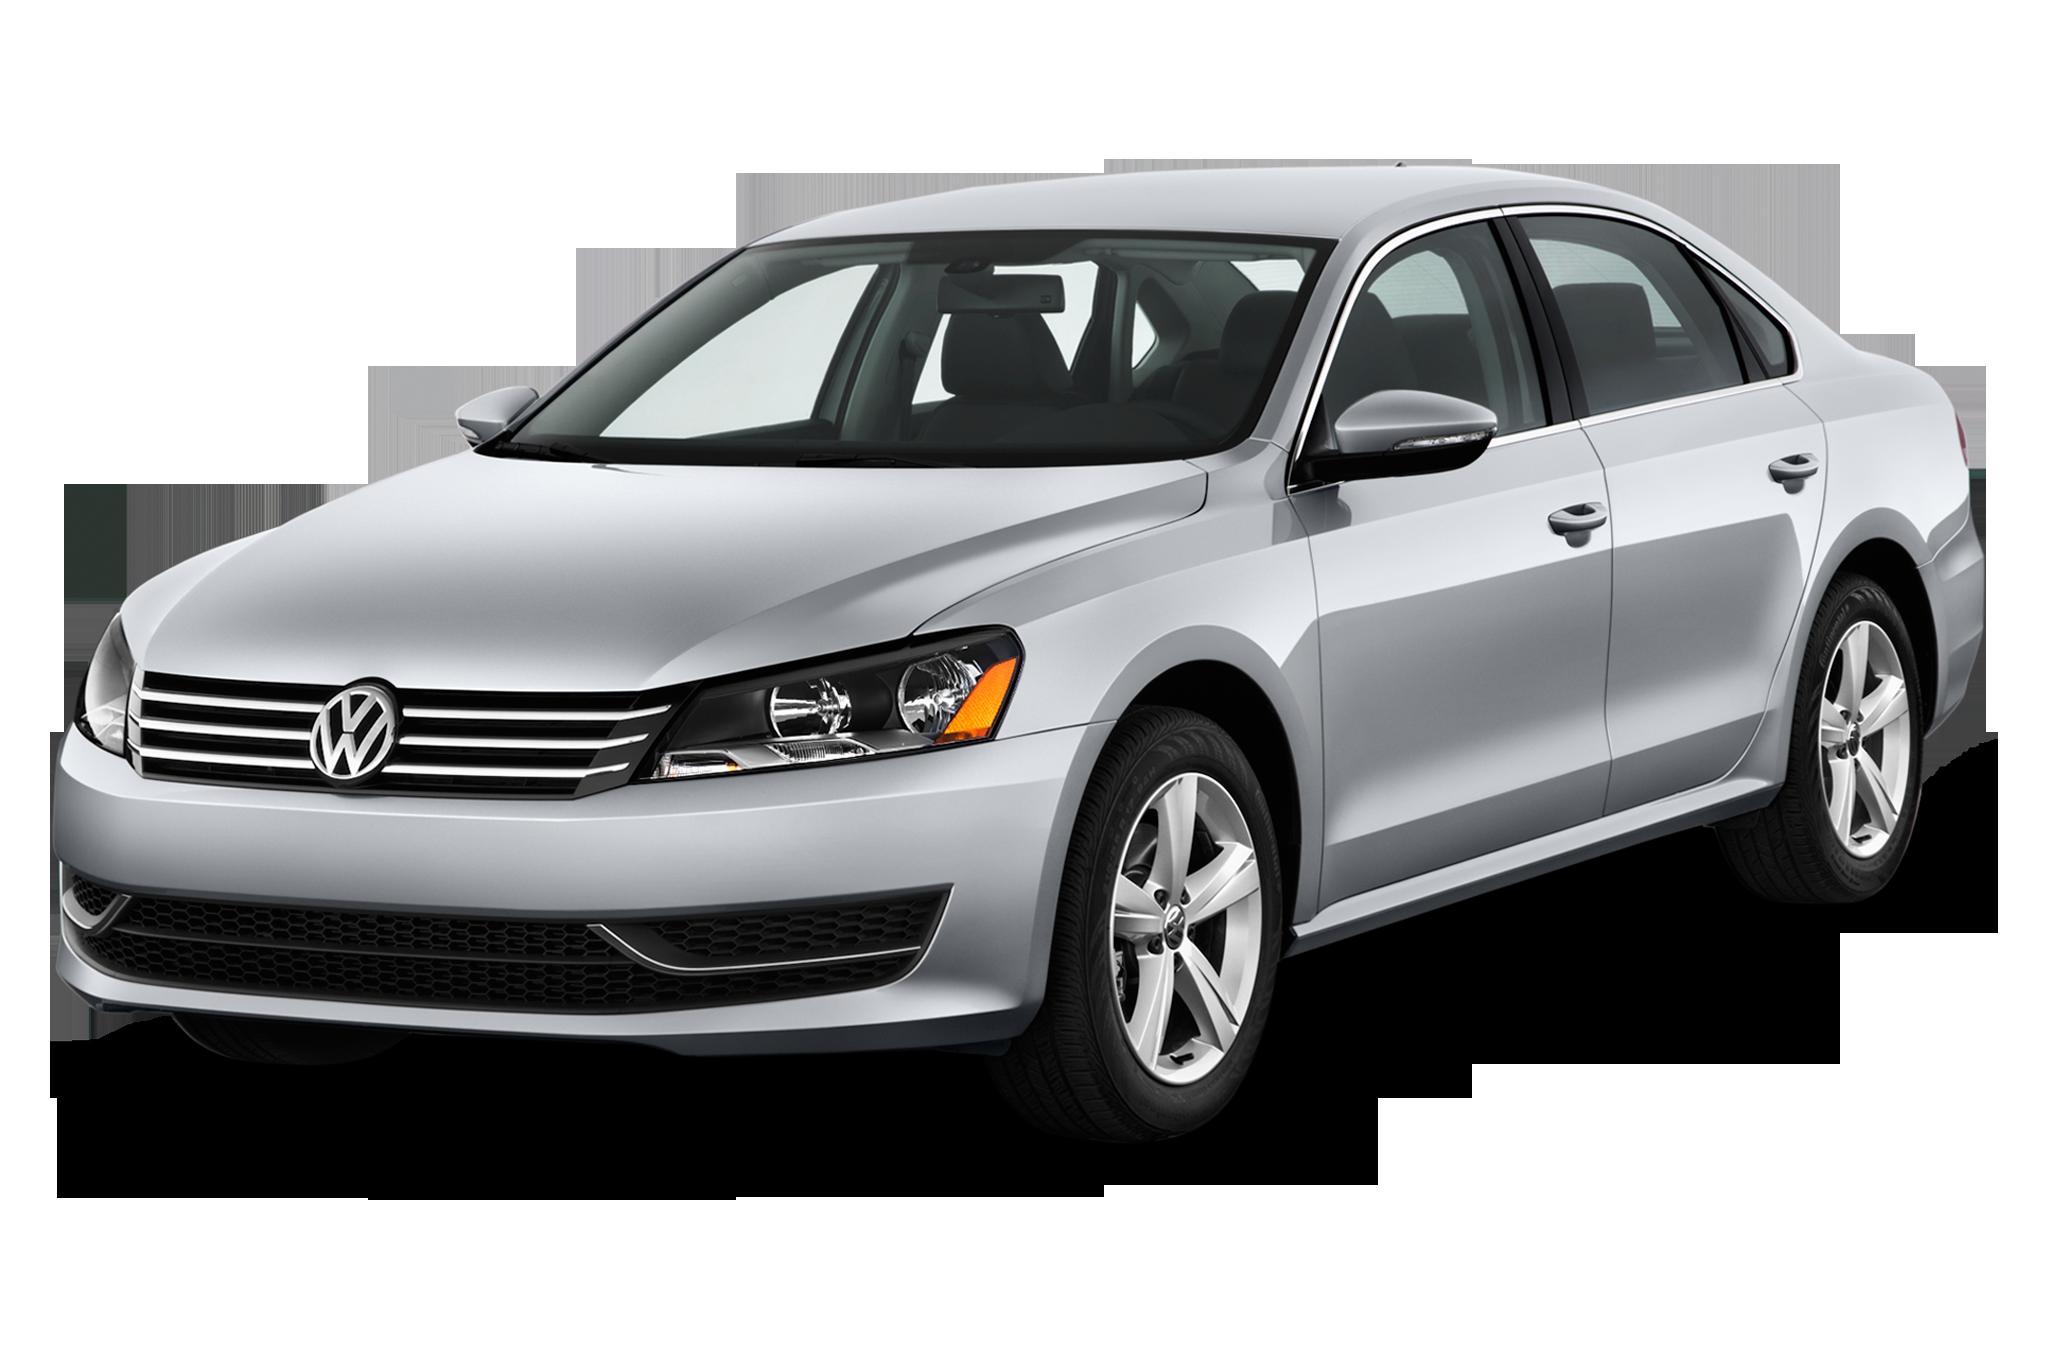 2012 Volkswagen Pat Reviews and Rating   Motor Trend